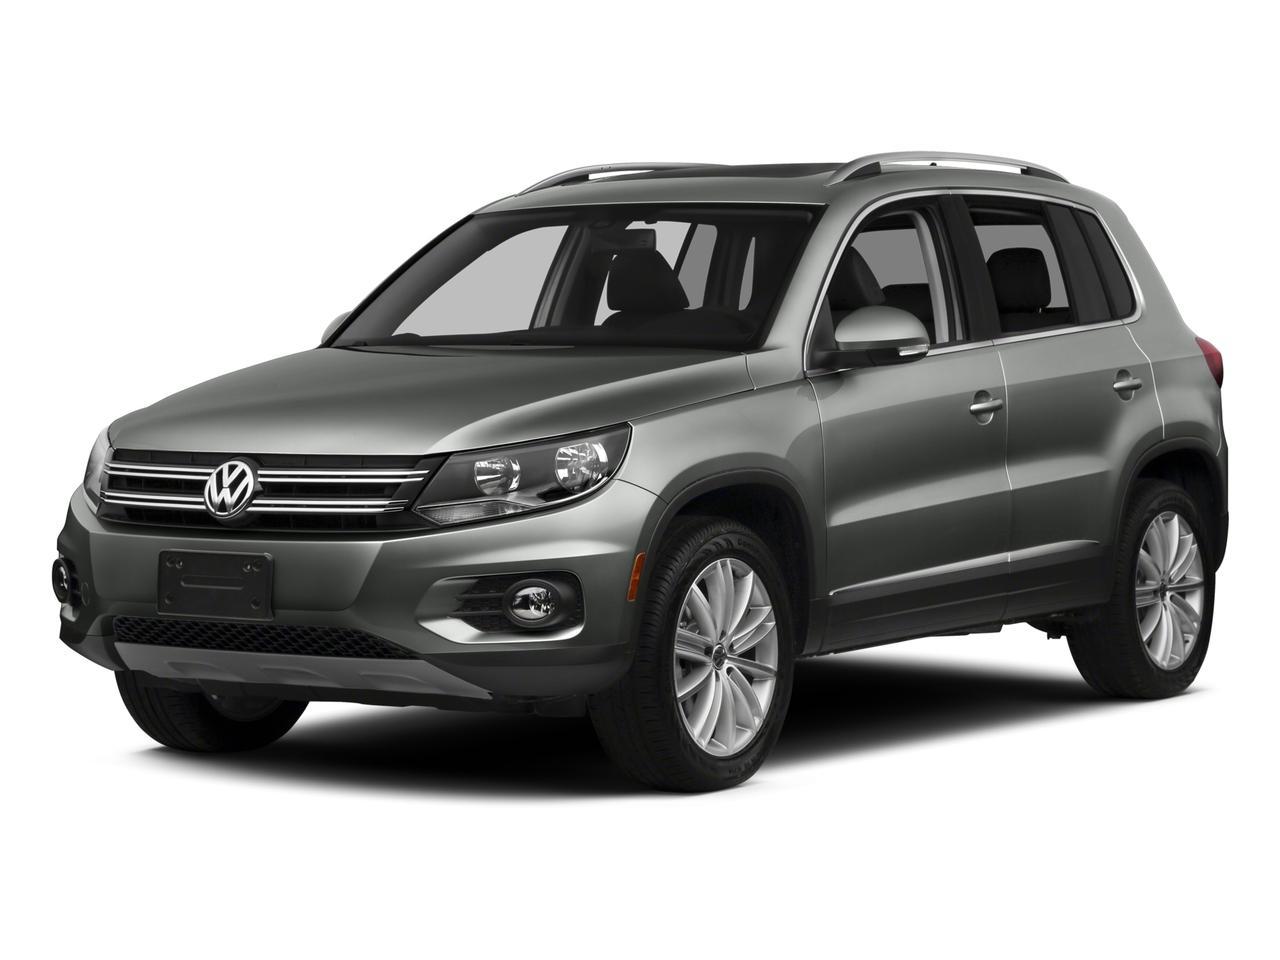 2016 Volkswagen Tiguan Vehicle Photo in Plainfield, IL 60586